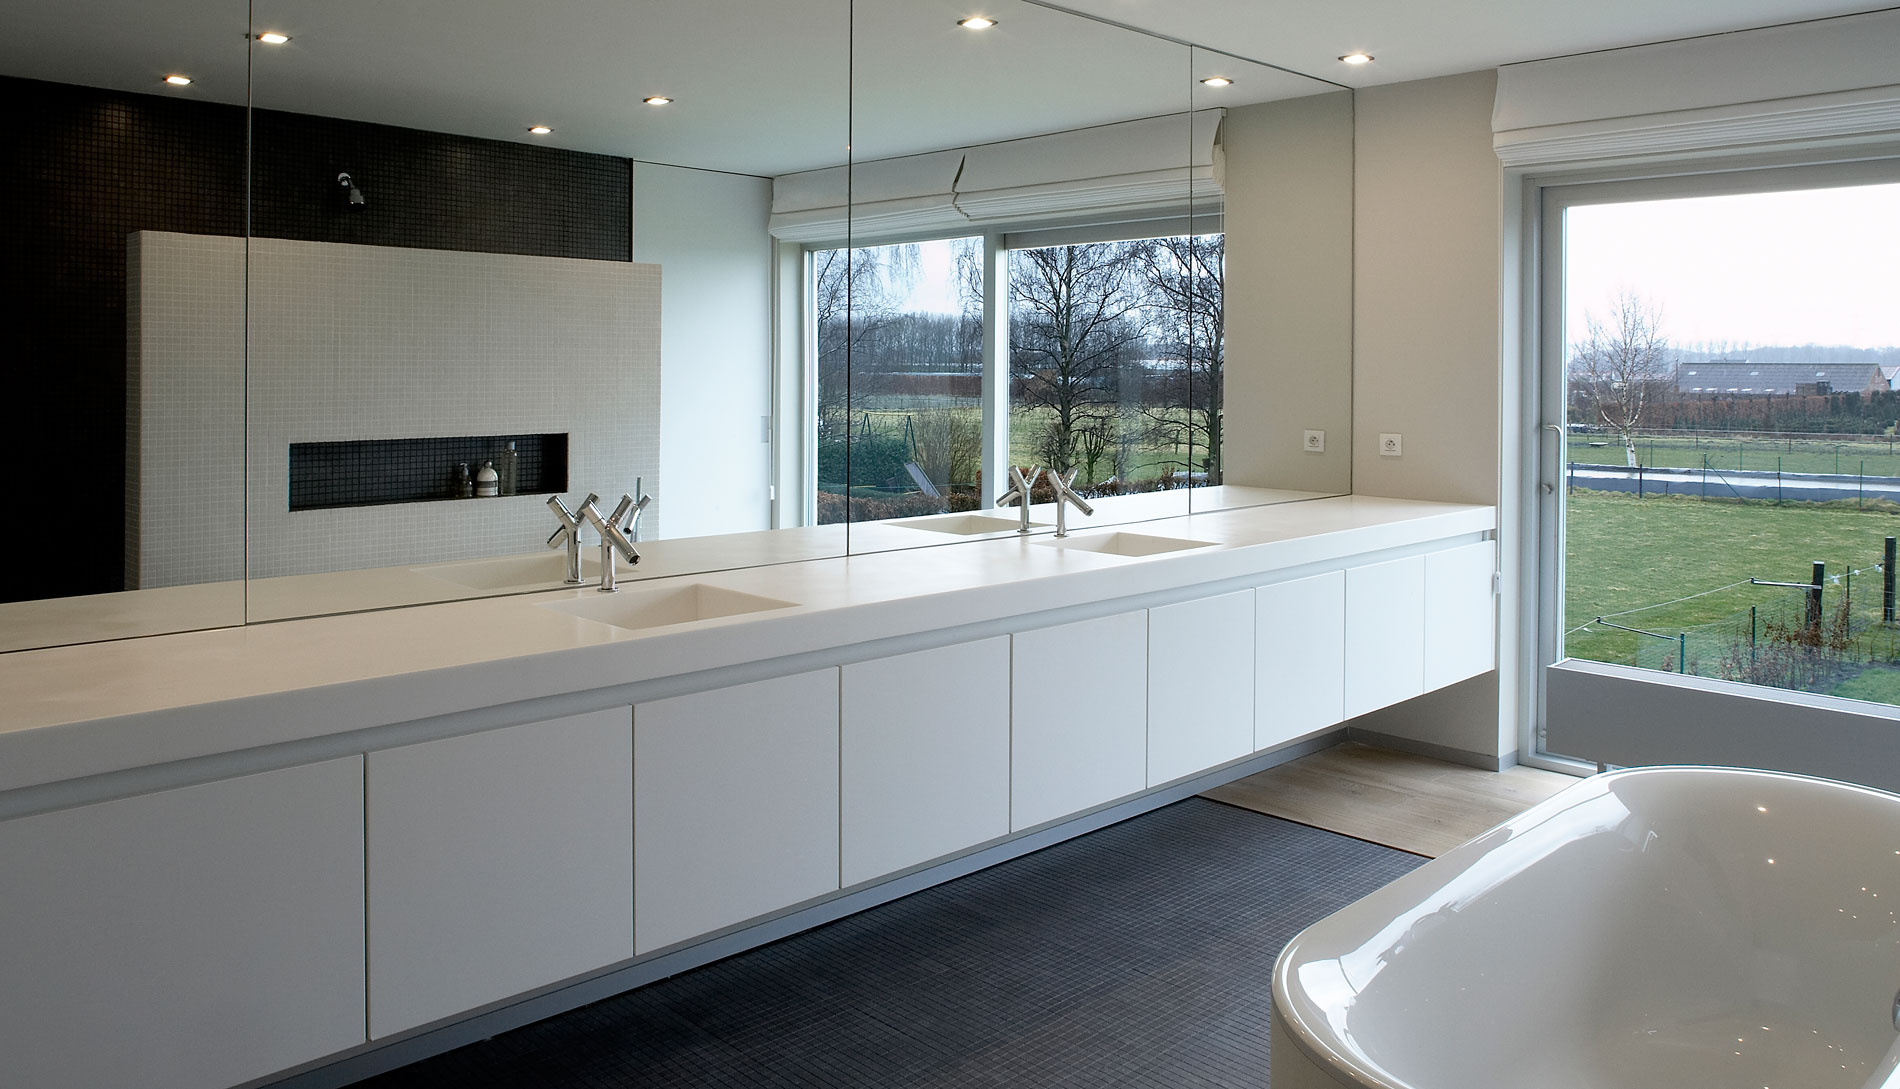 Keukens badkamers en interieur mp buyl gent en omgeving keukens mp buyl - Keuken ontwikkeling m ...